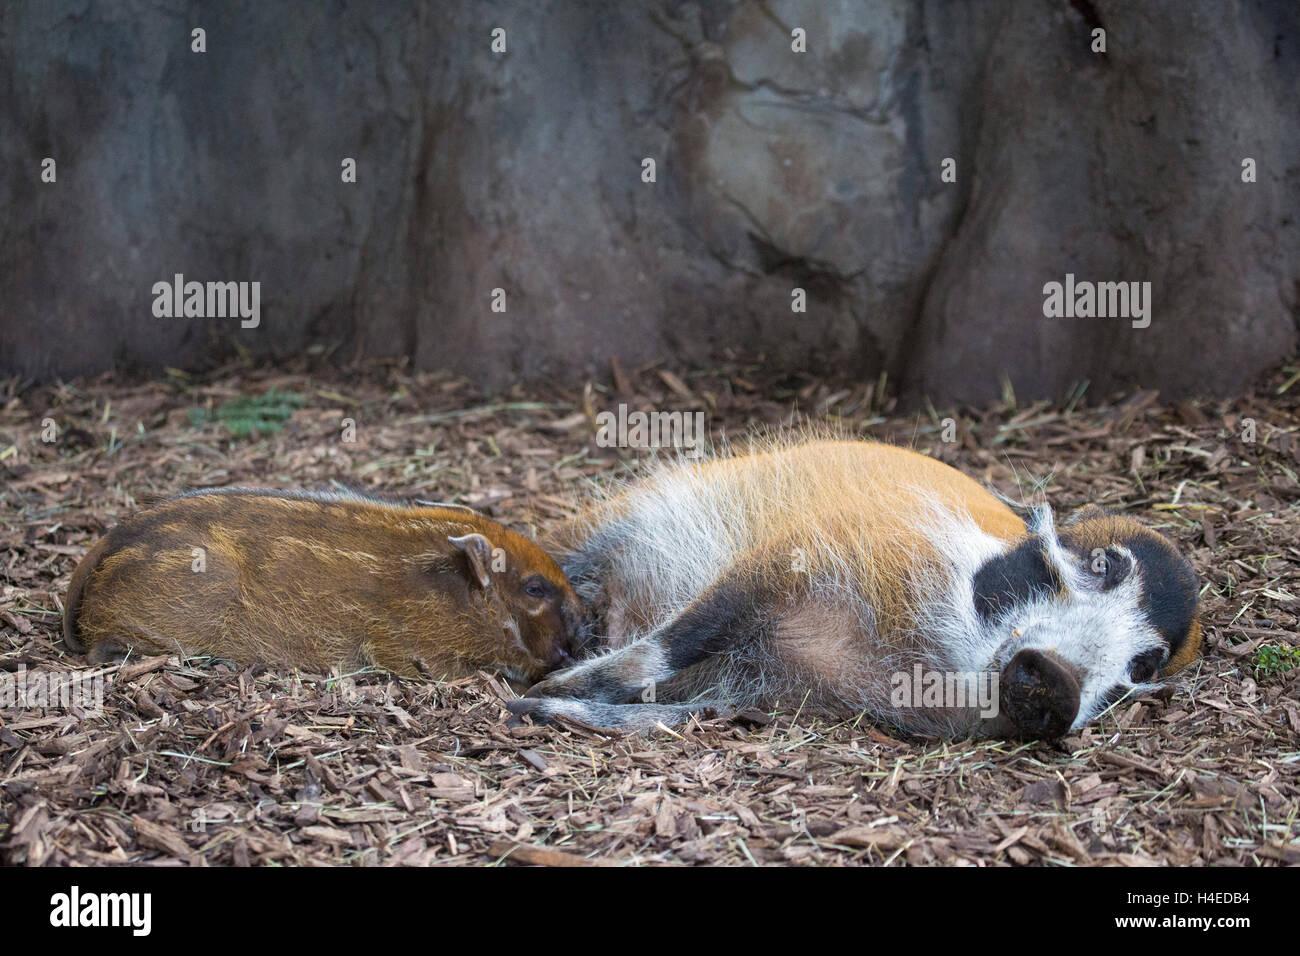 Red River Hog mother nursing baby (Potamochoerus porcus) - Stock Image